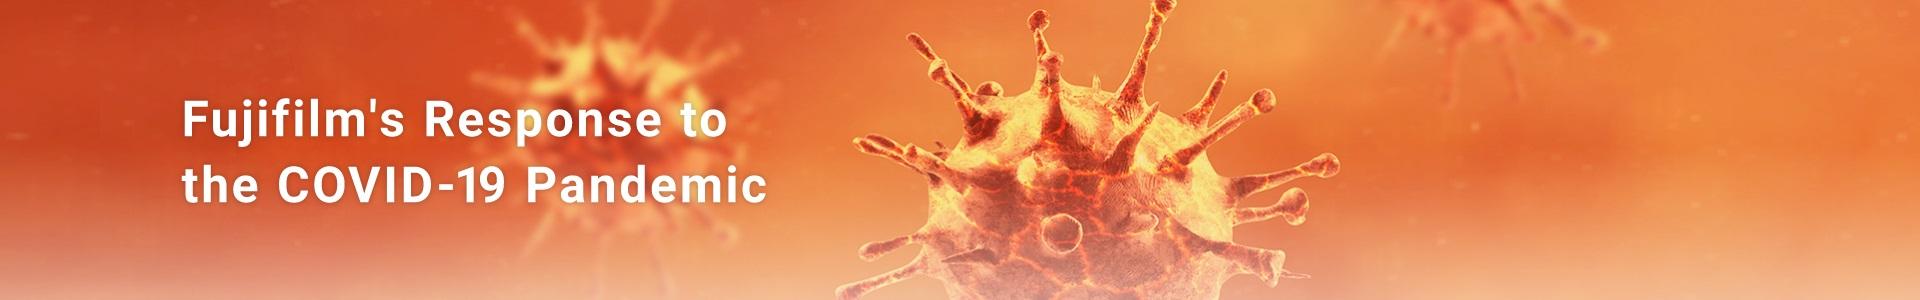 Fujifilm's Response to the COVID-19 Pandemic